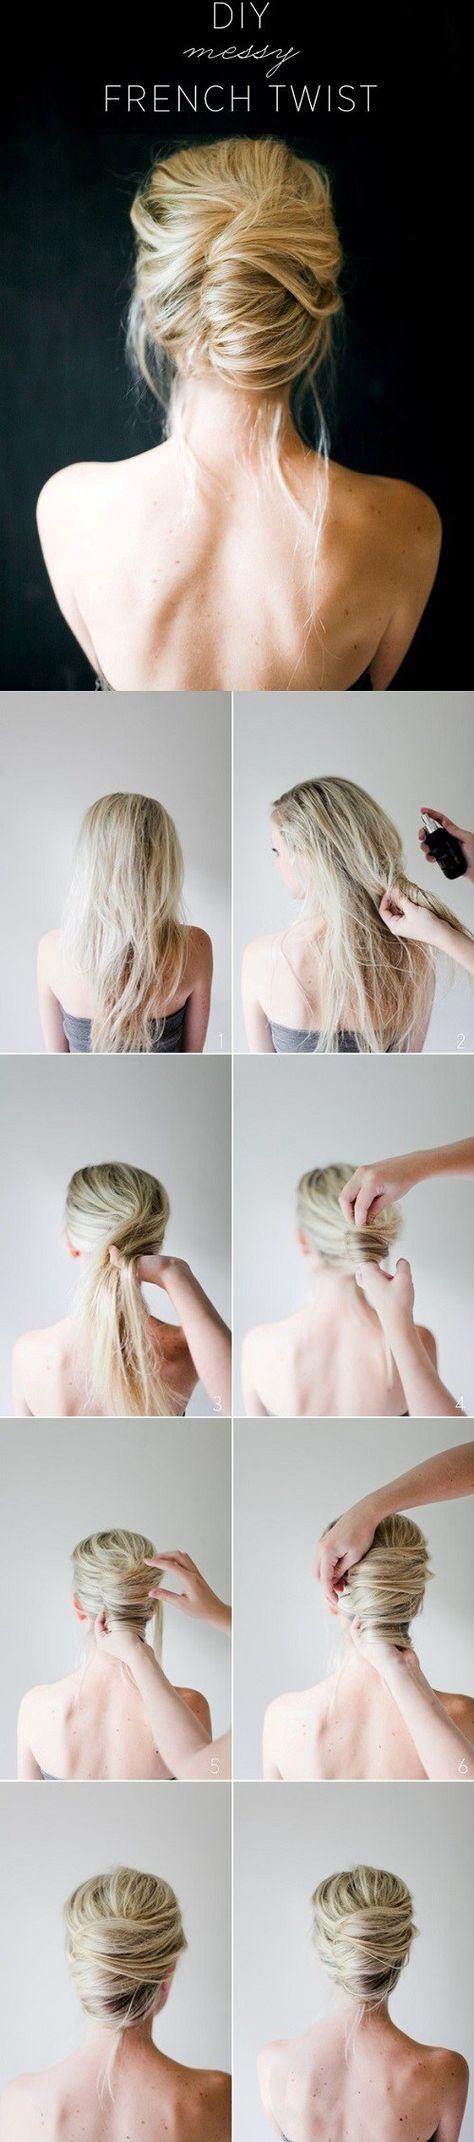 hair tutorials you can totally diy hair style french braid